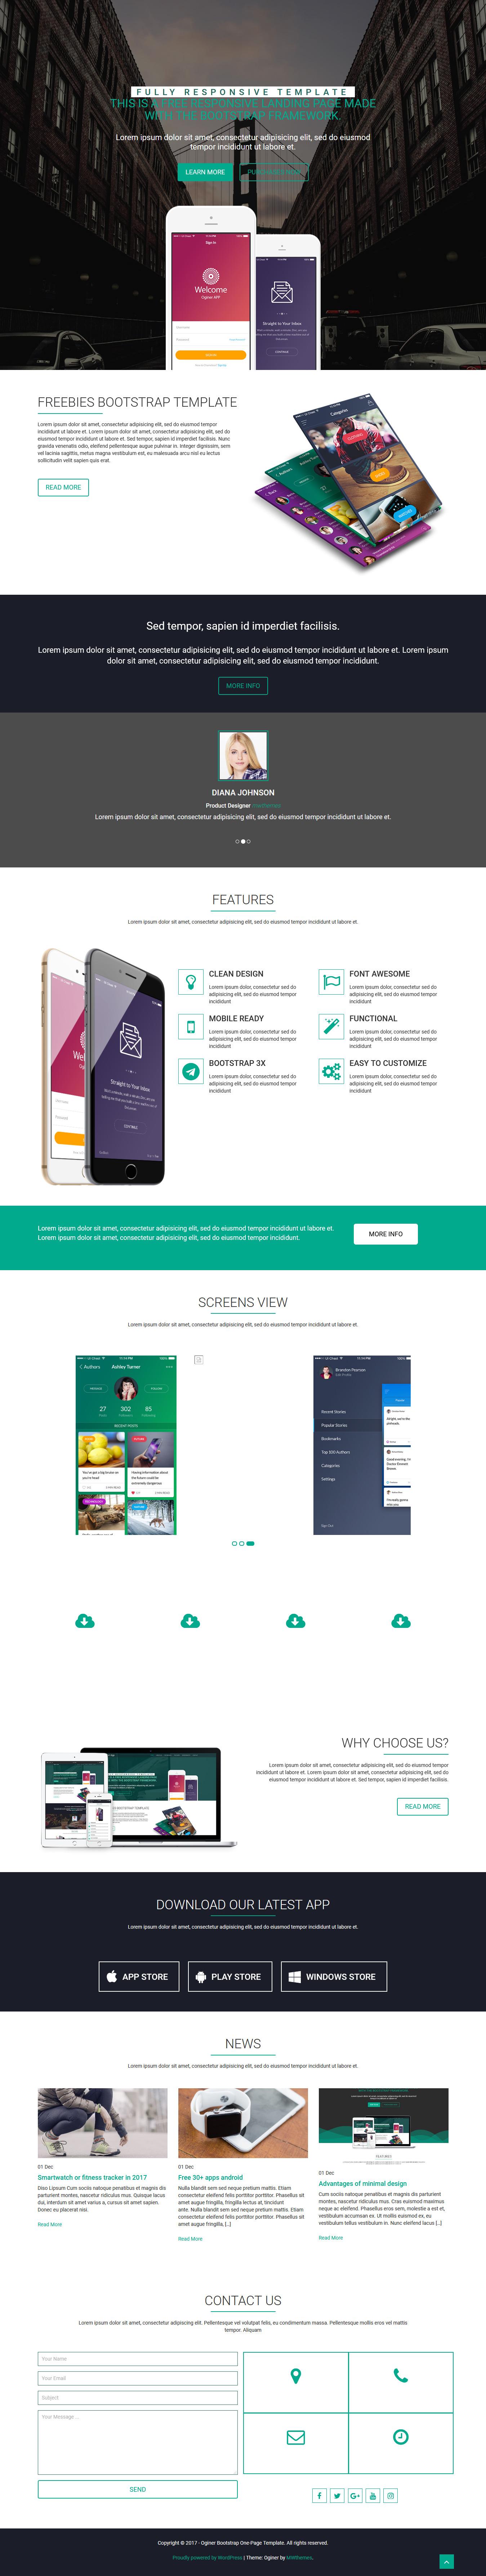 oginer best free mobile app wordpress theme - 10+ Best Free Mobile App WordPress Themes